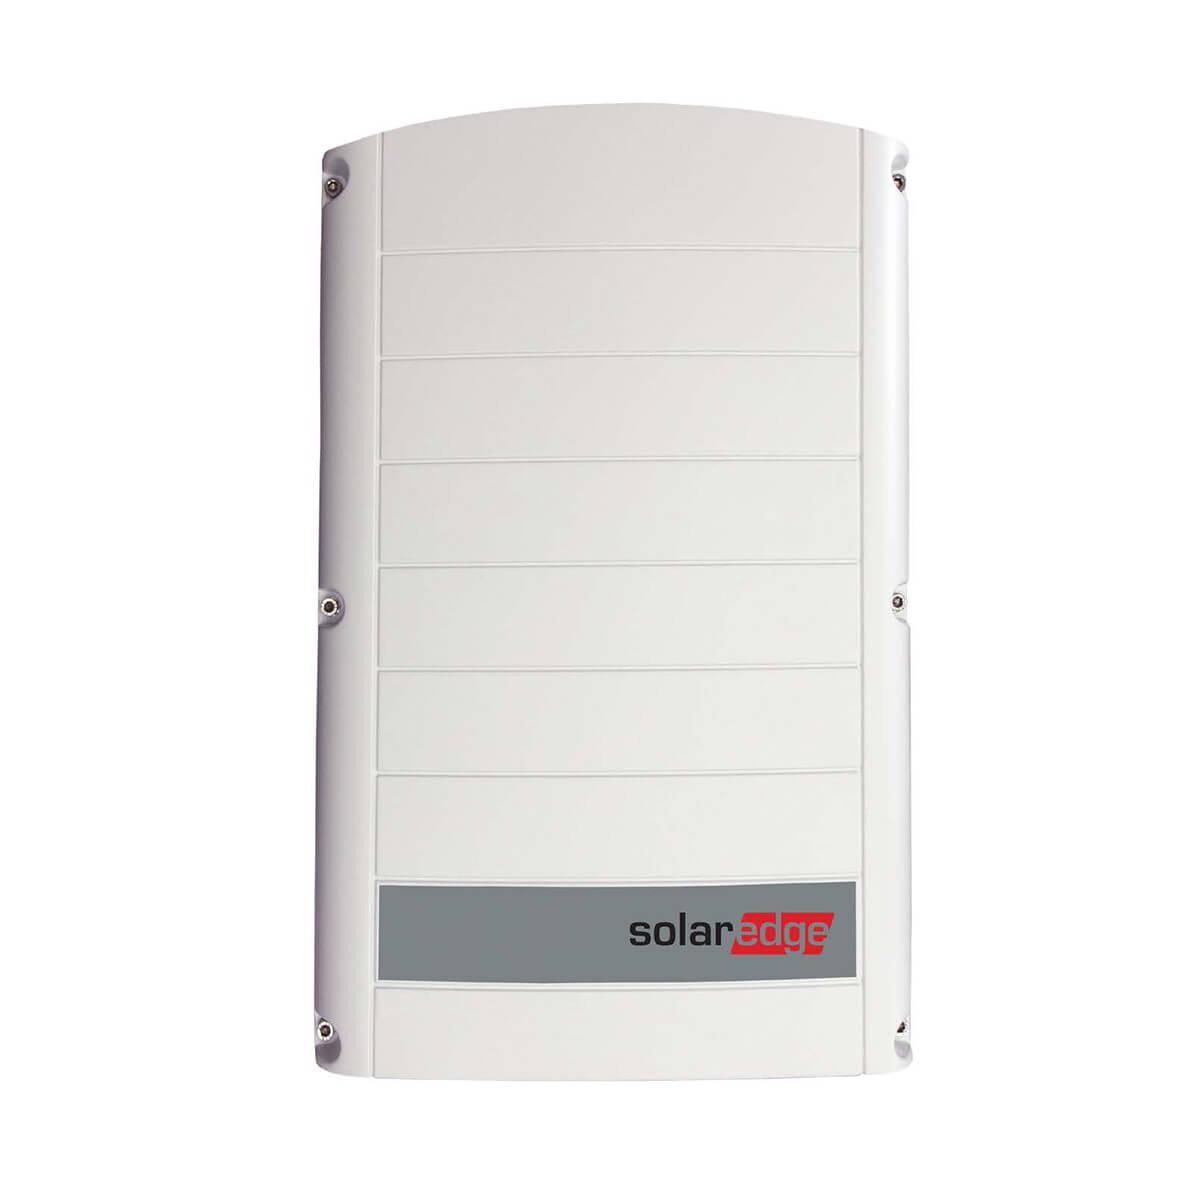 solaredge 25kW inverter, solaredge se25k 25kW inverter, solaredge se25k inverter, solaredge se25k, solaredge 25 kW, SOLAREDGE 25KW